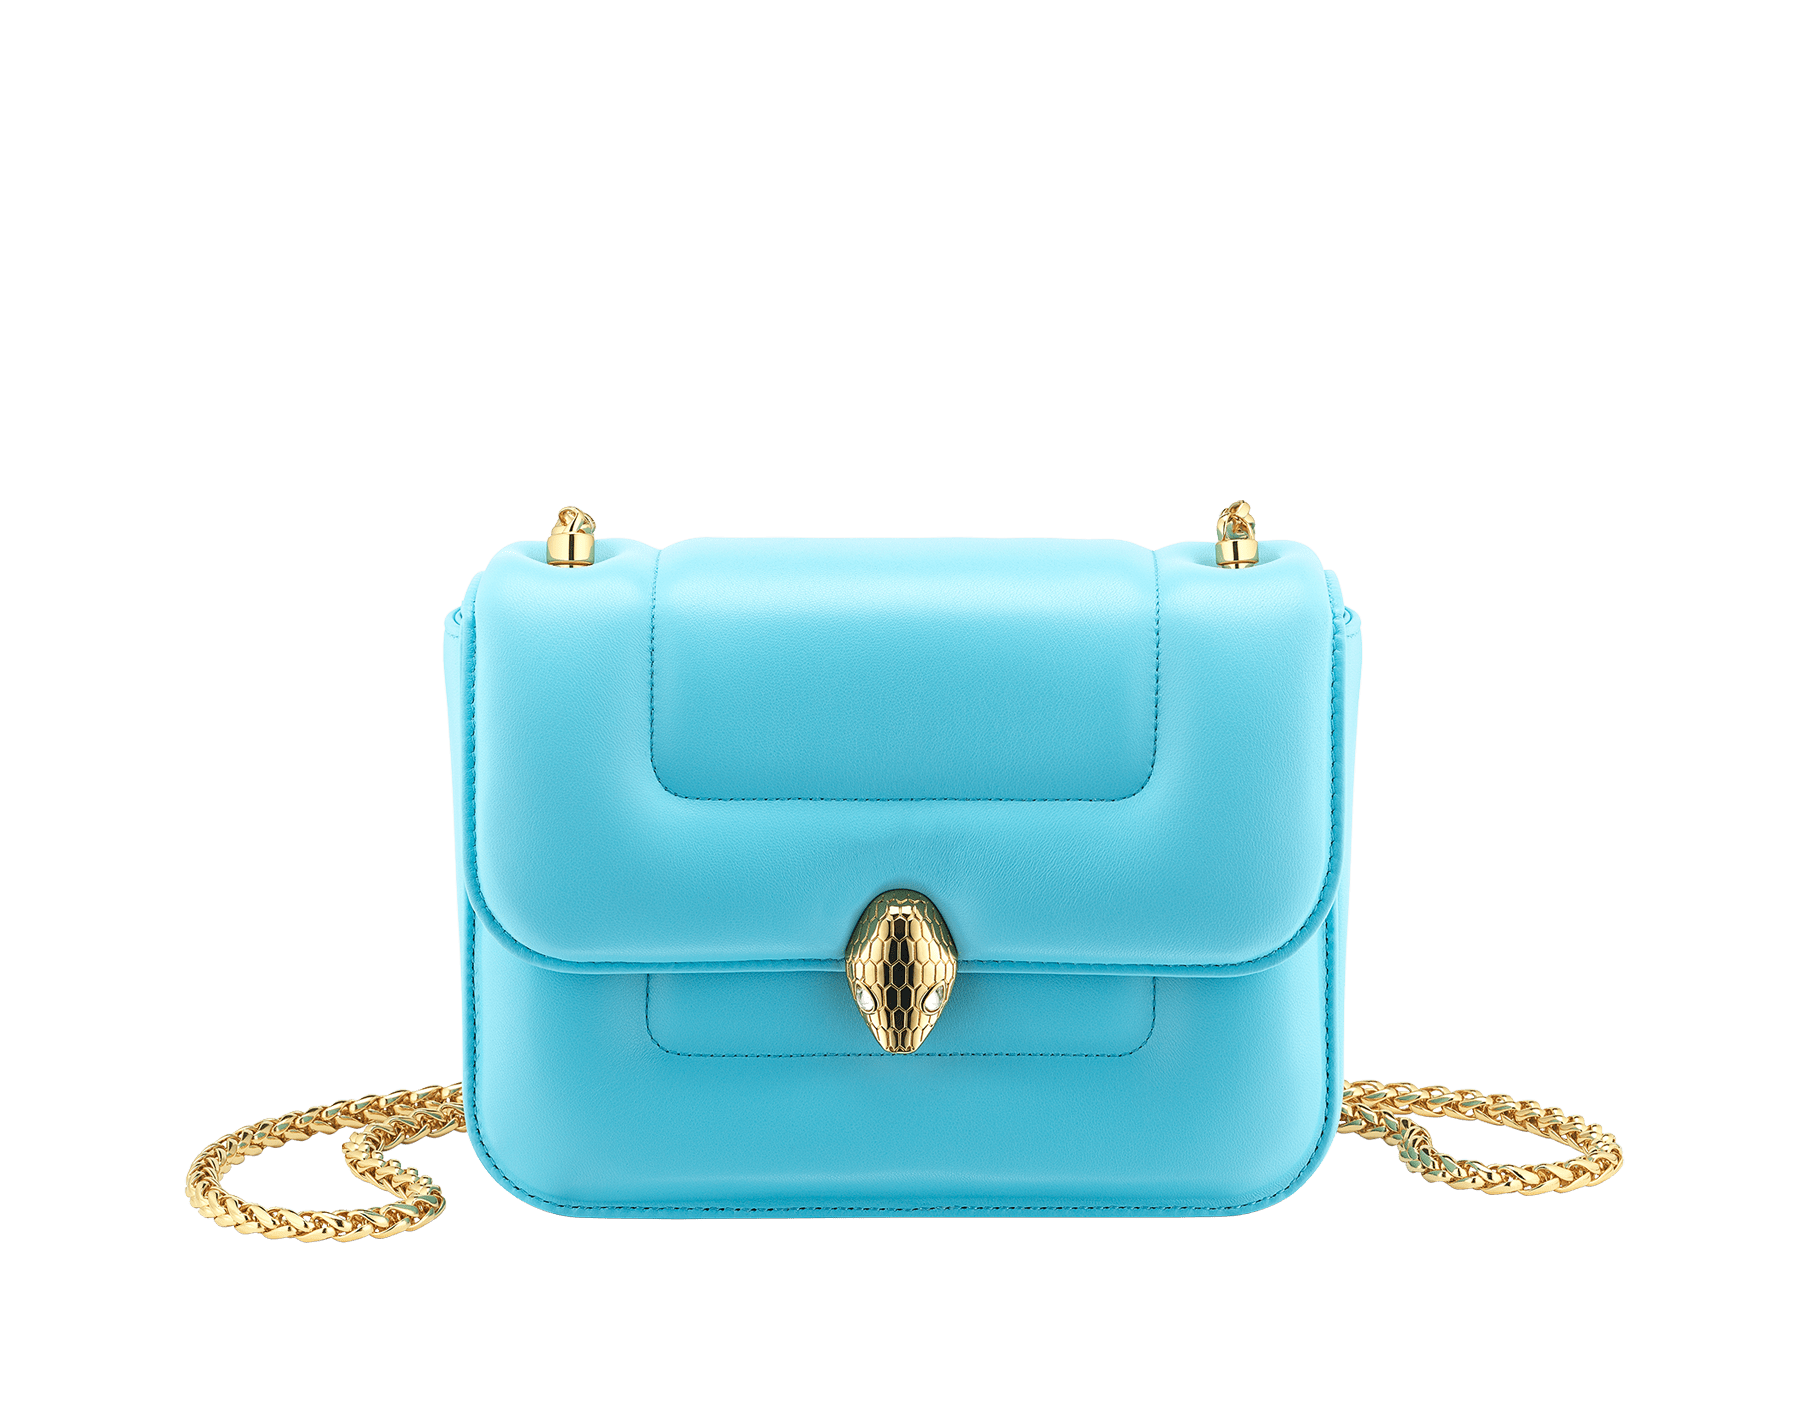 Mary Katrantzou x Bvlgari 手提包,採用柔軟的 Aegean Toapz 藍色絎縫納帕軟面皮,Aegean Toapz 藍色納帕軟面皮襯裡。新式金色黃銅 Serpenti 蛇頭扣環,誘人蛇眼鑲飾水晶。特別版包款。 MK-1142 image 4